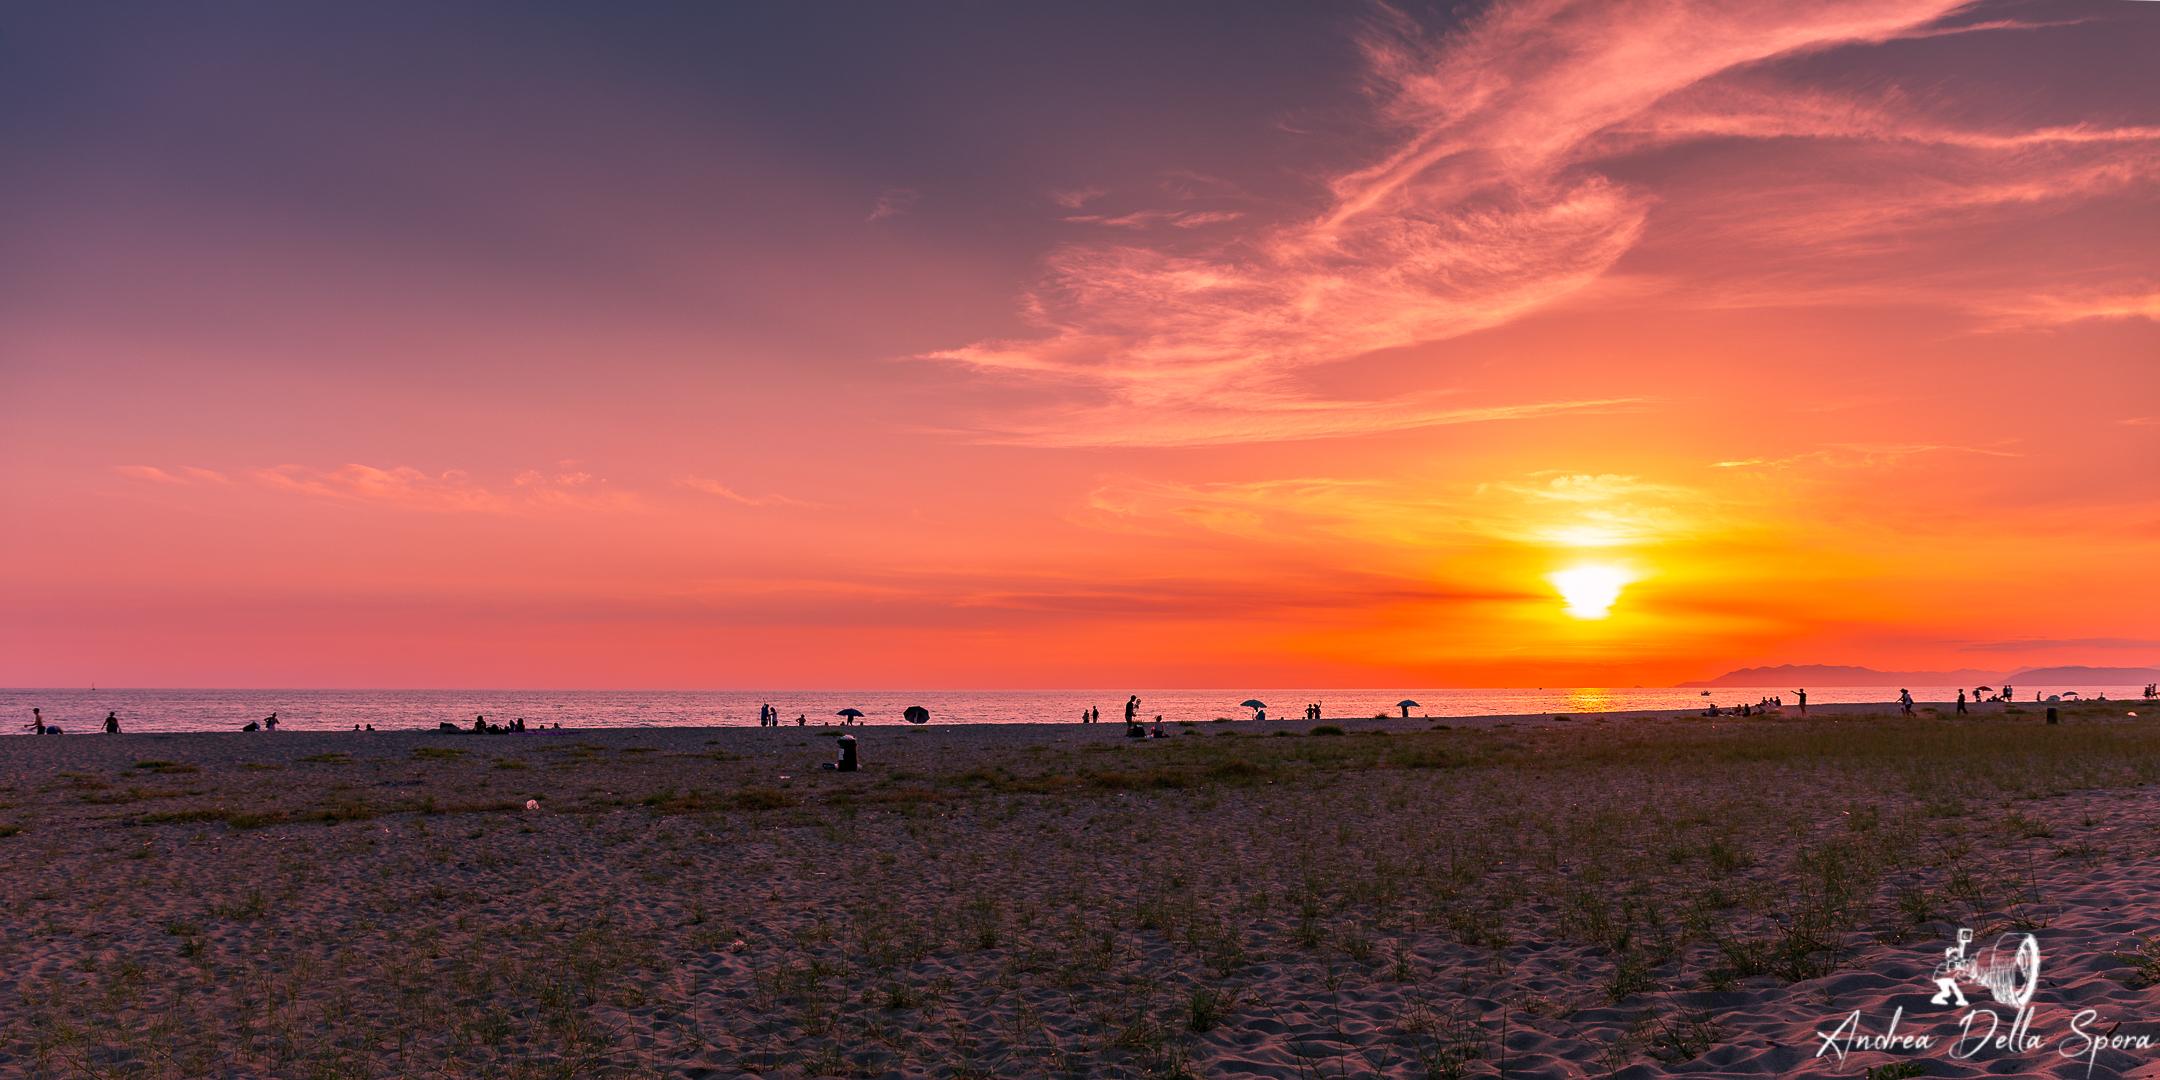 FREE BEACH – VIAREGGIO